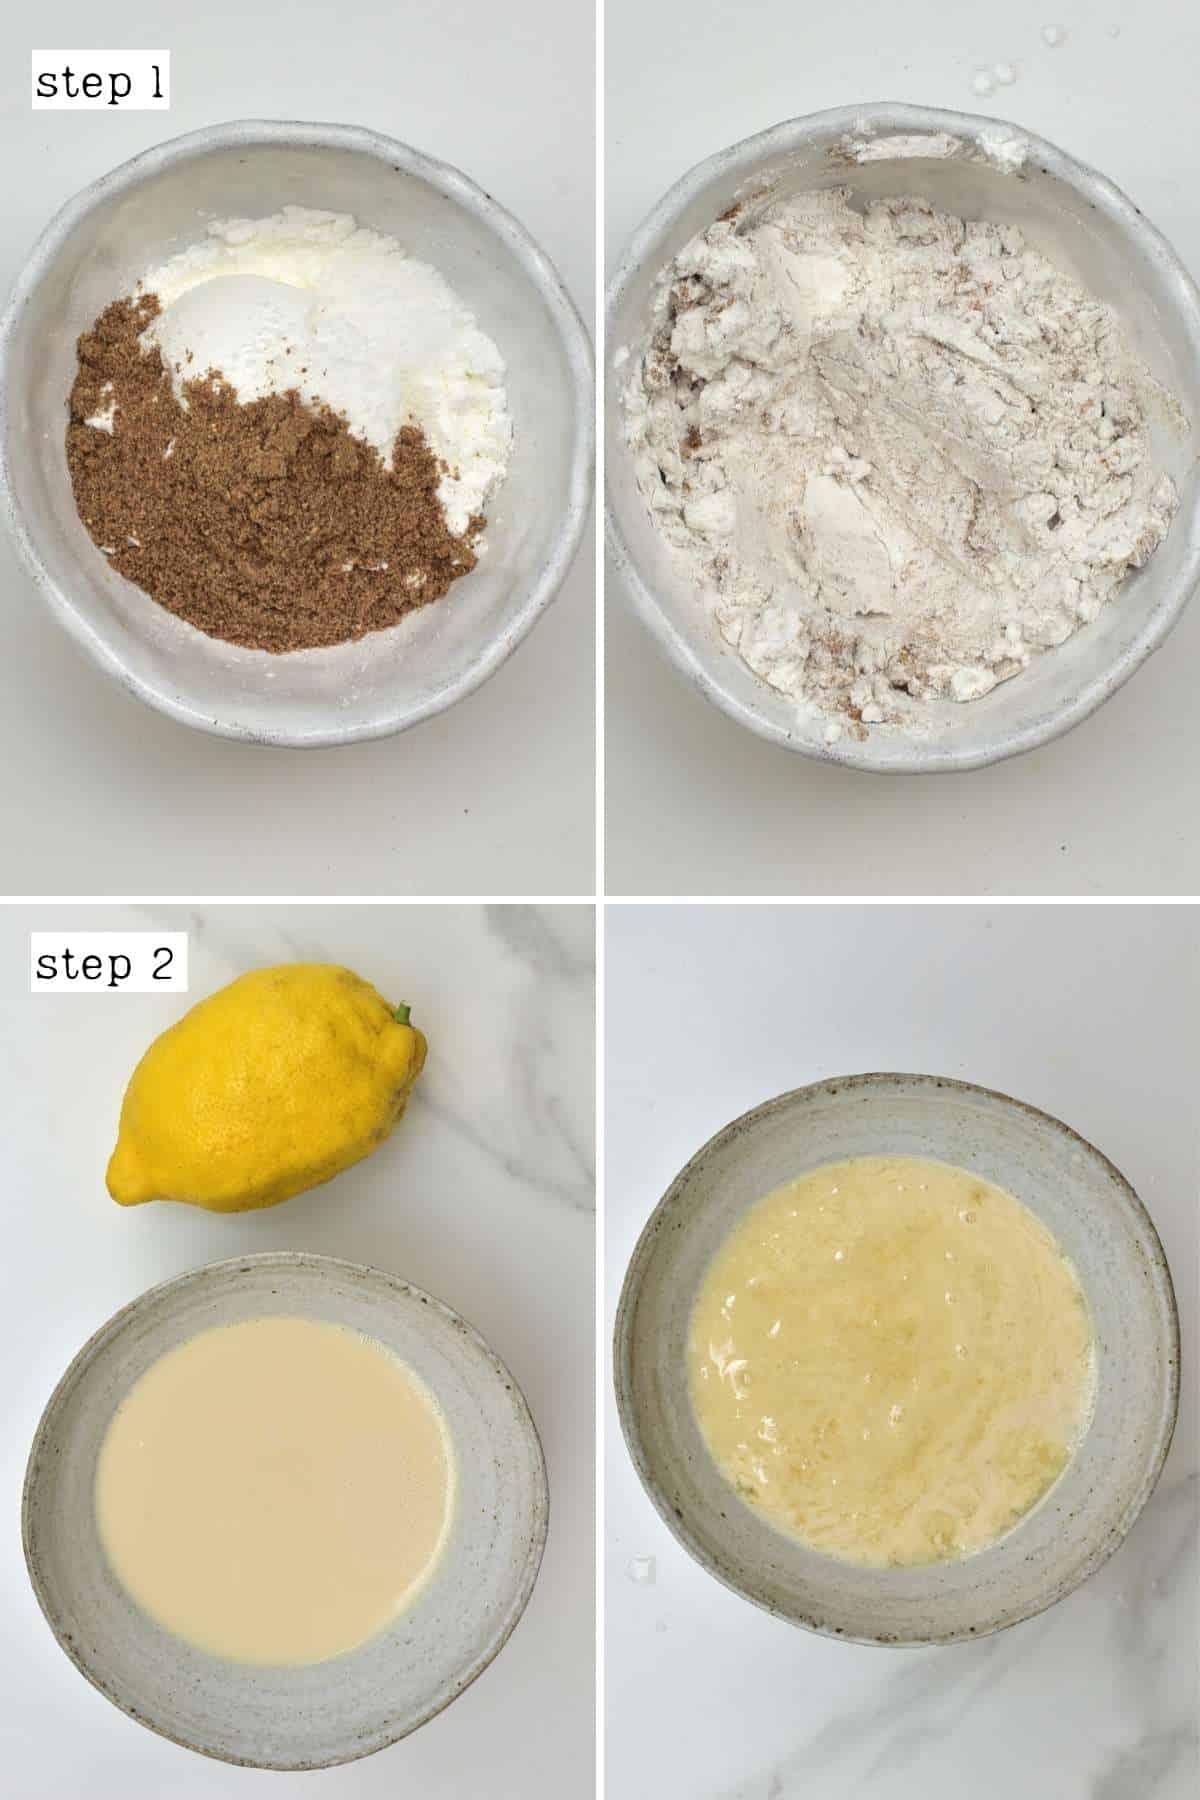 Steps for preparing ingredients for crispy mushrooms